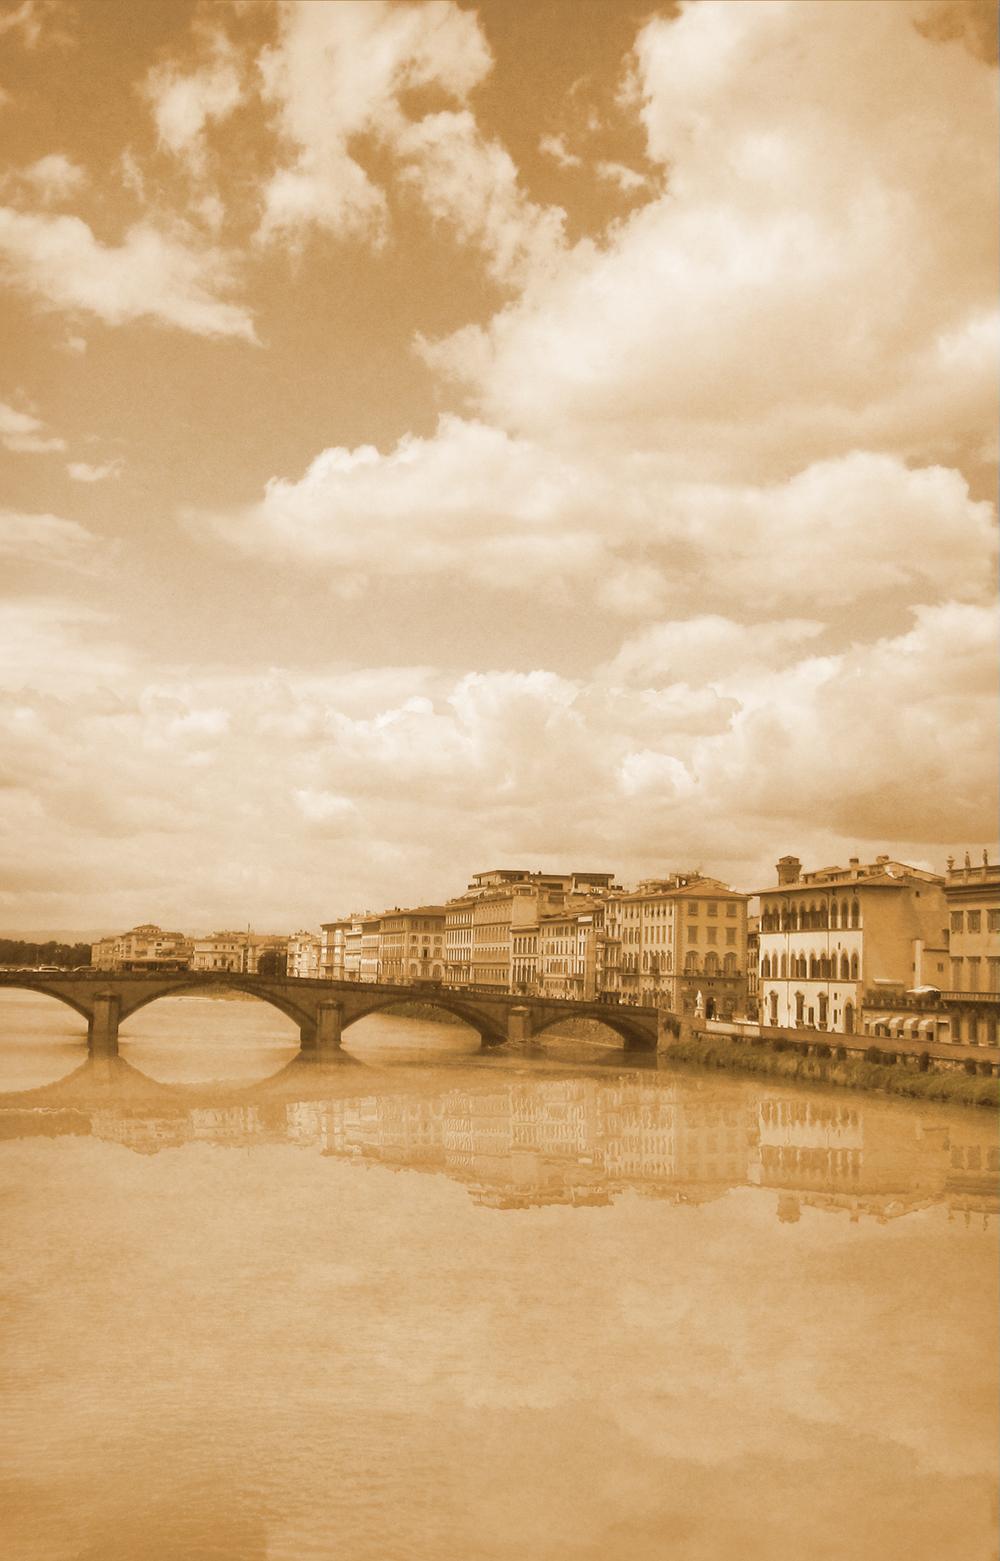 ponte_santatrinita_goldn8_14.jpg